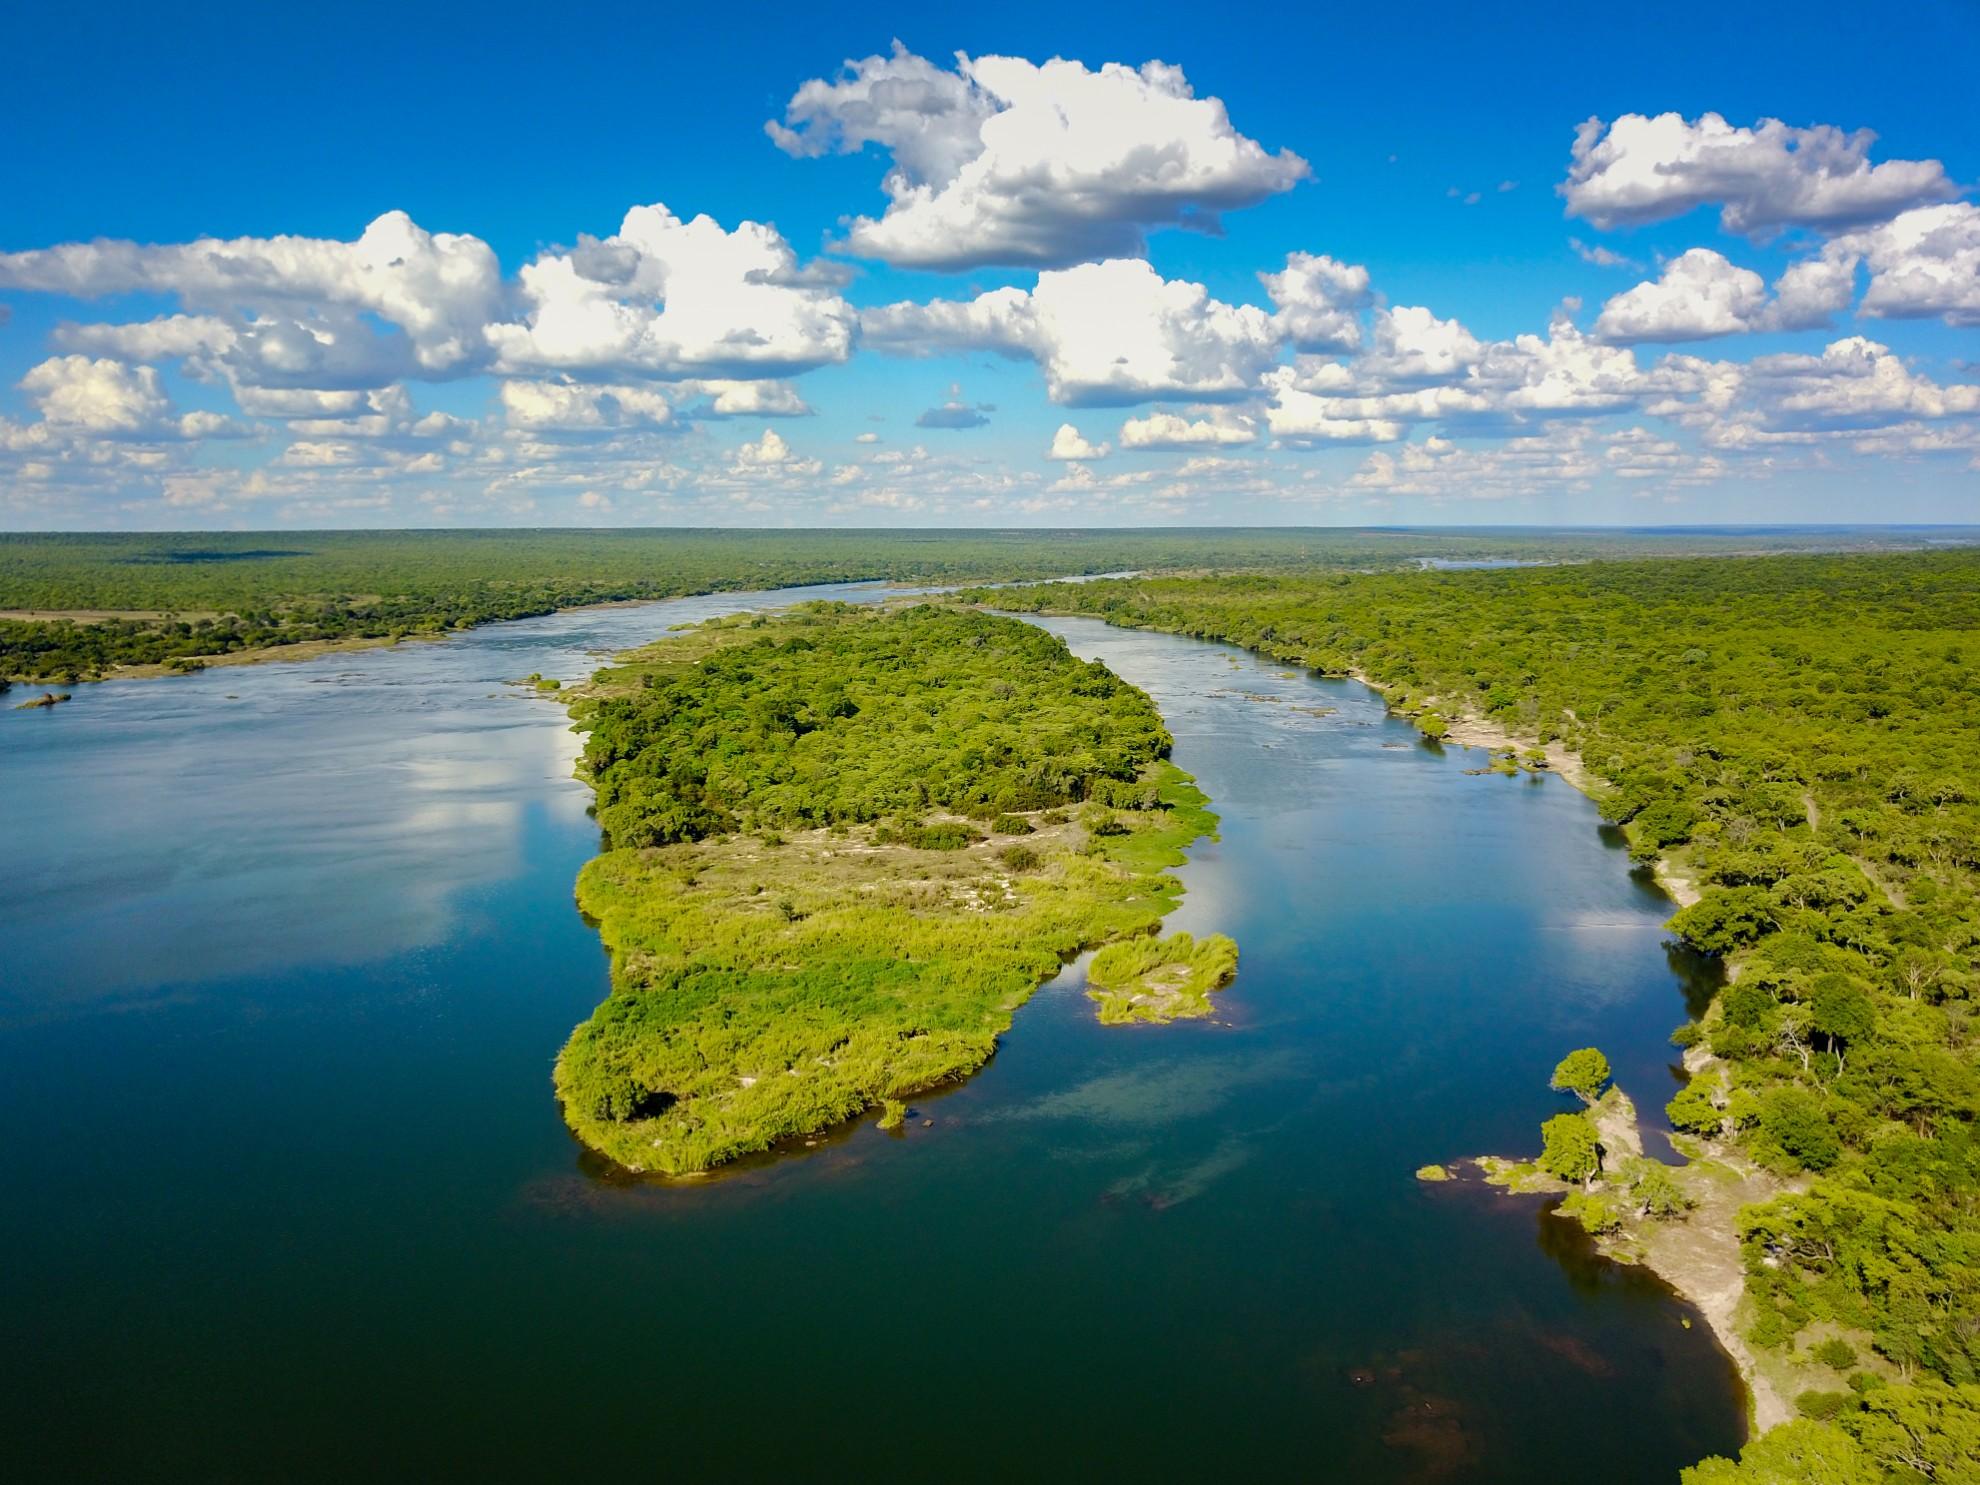 Tsowa Safari Island Victoria Falls Zimbabwe Island from above